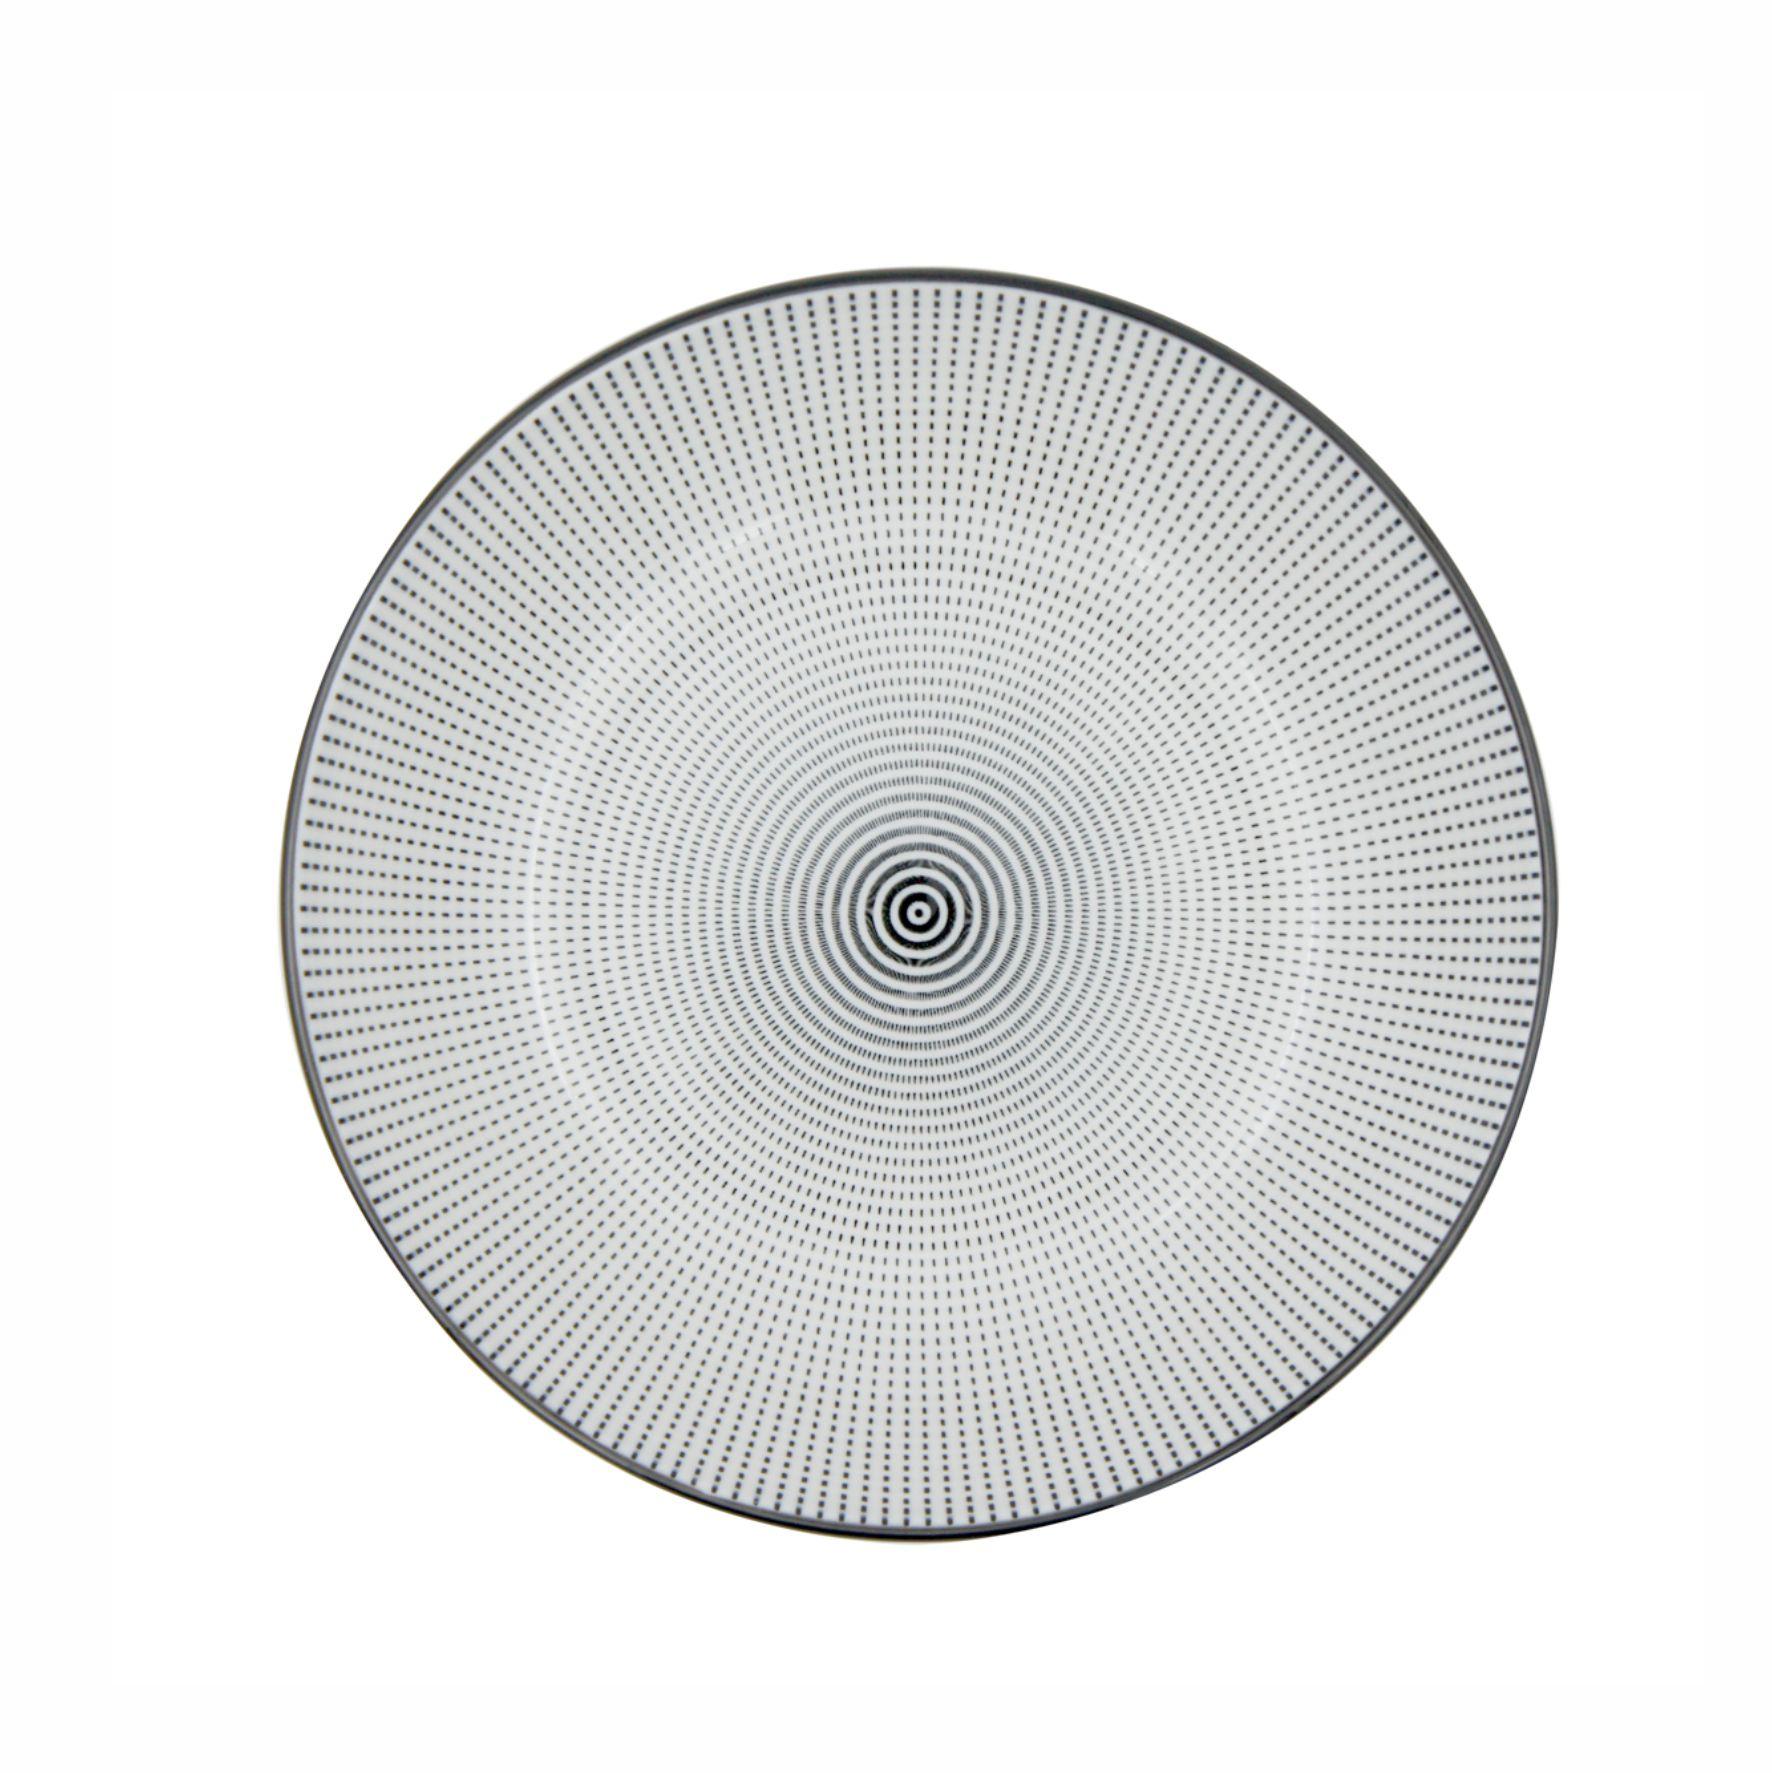 Prato Porcelana Decor Dot Angles Preto e Branco 20,4cm - Urban